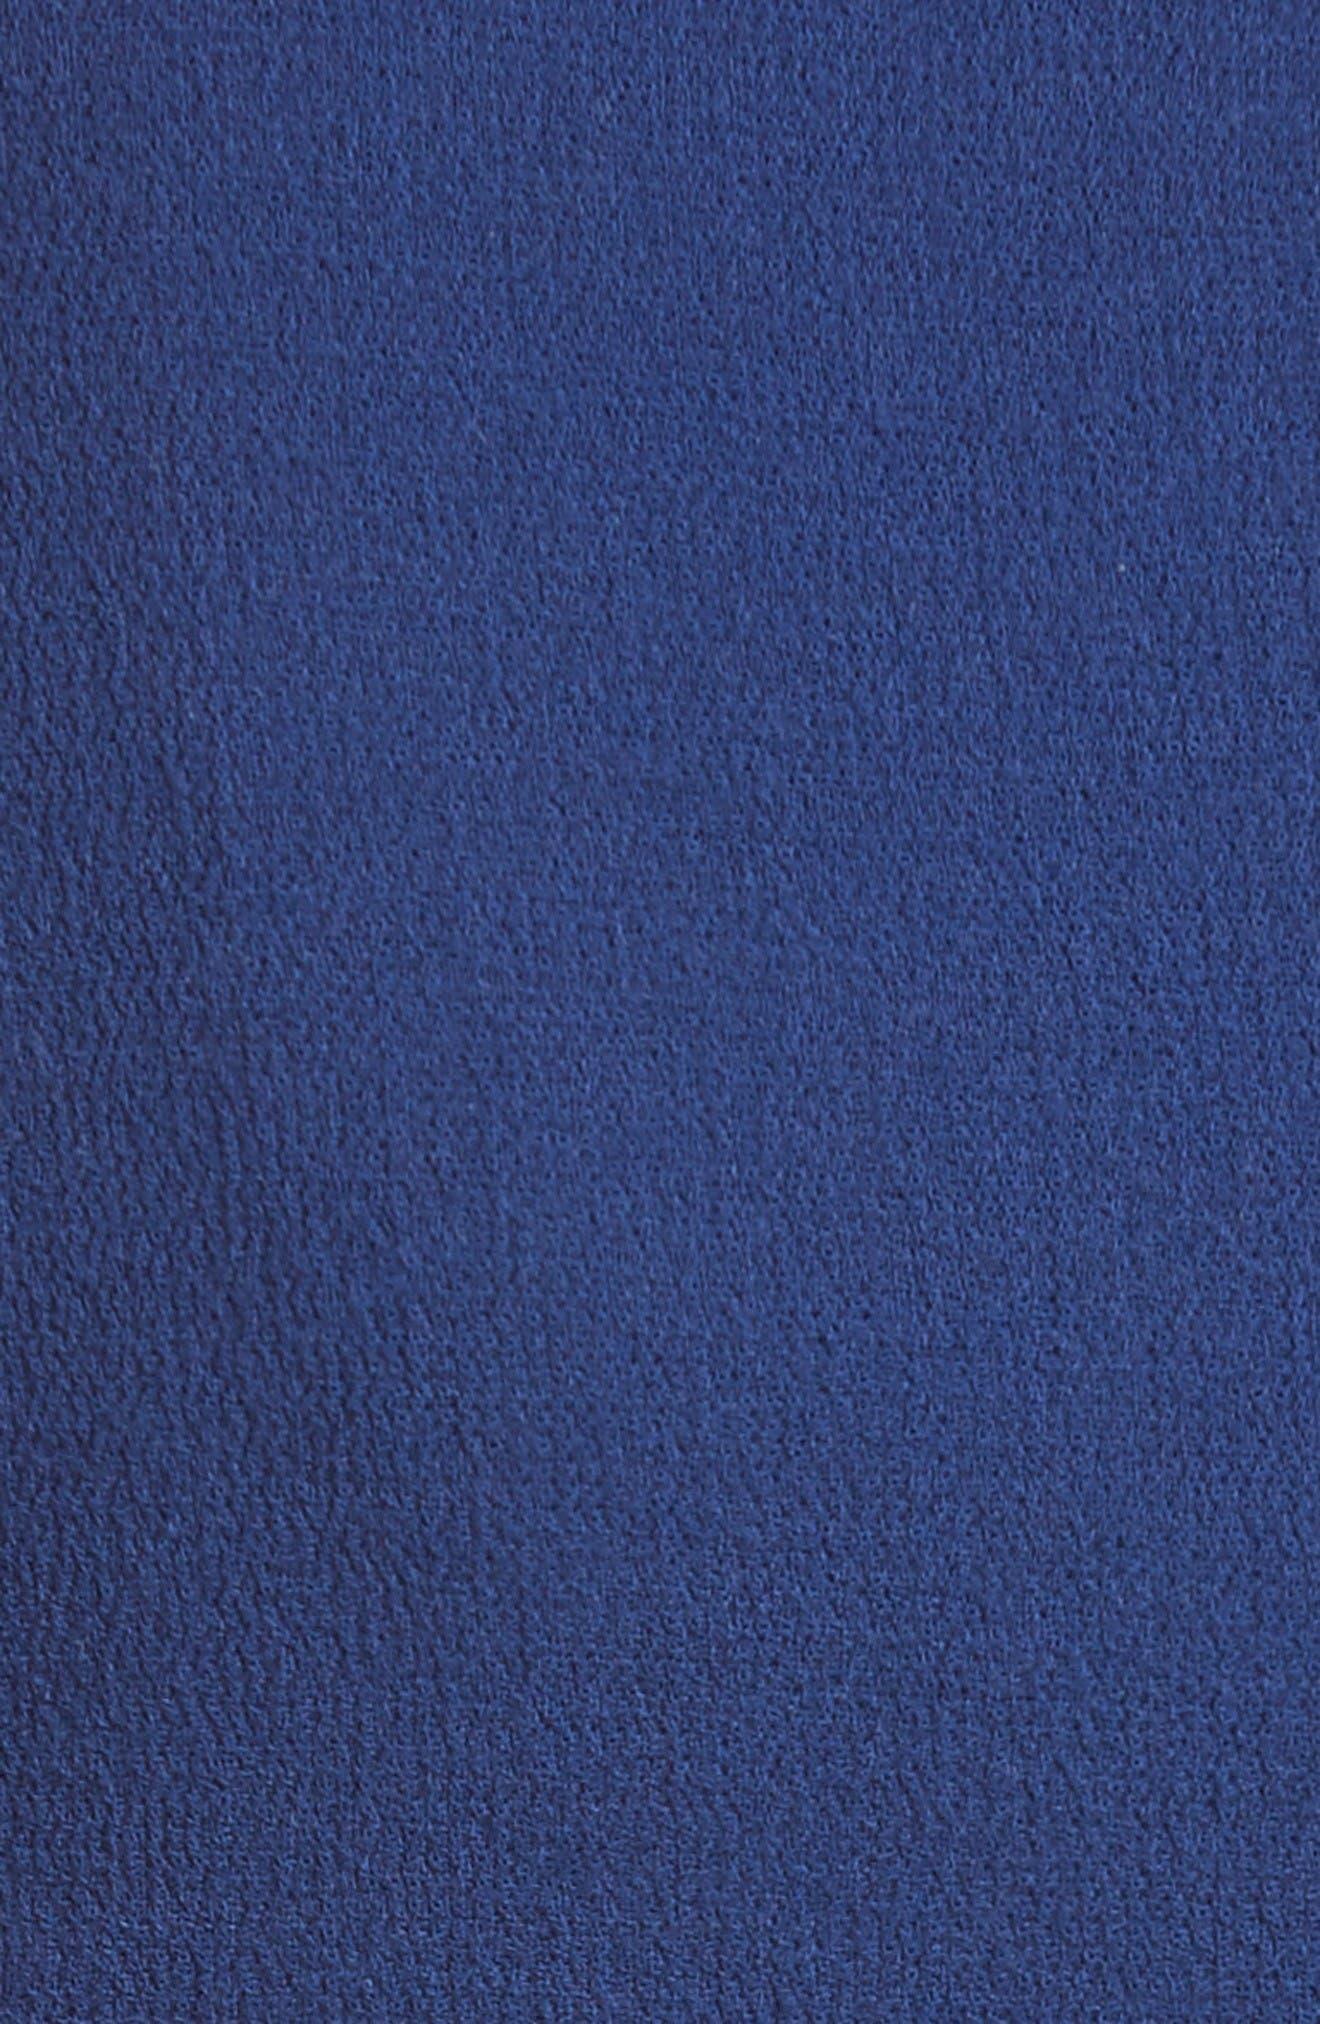 Double Crepe Peplum Jacket,                             Alternate thumbnail 3, color,                             Royal Blue